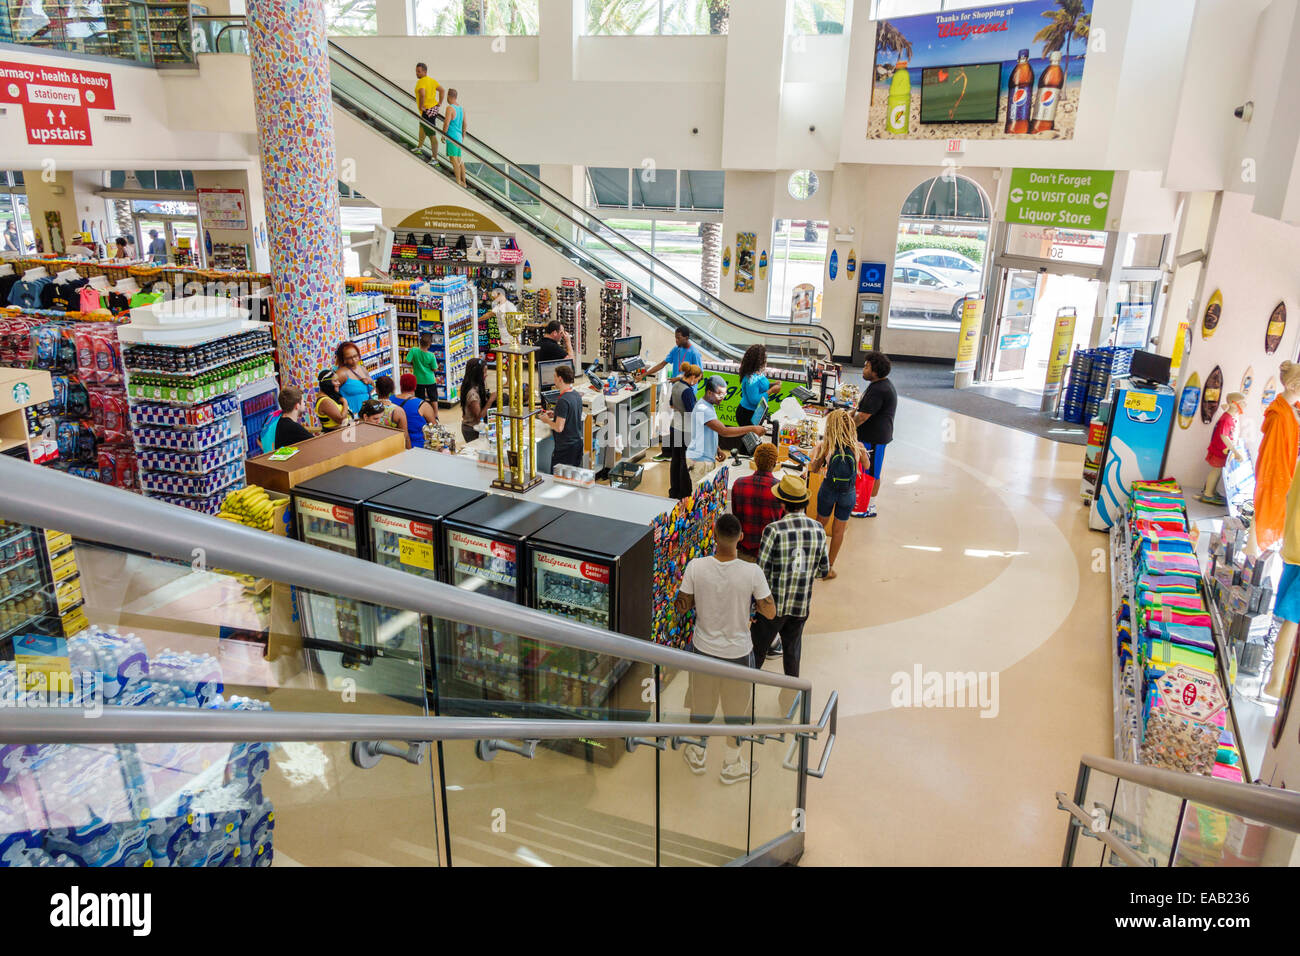 795cf15886 Miami Beach Florida Walgreens pharmacy drugstore inside interior check-out  line queue cashier customers retail